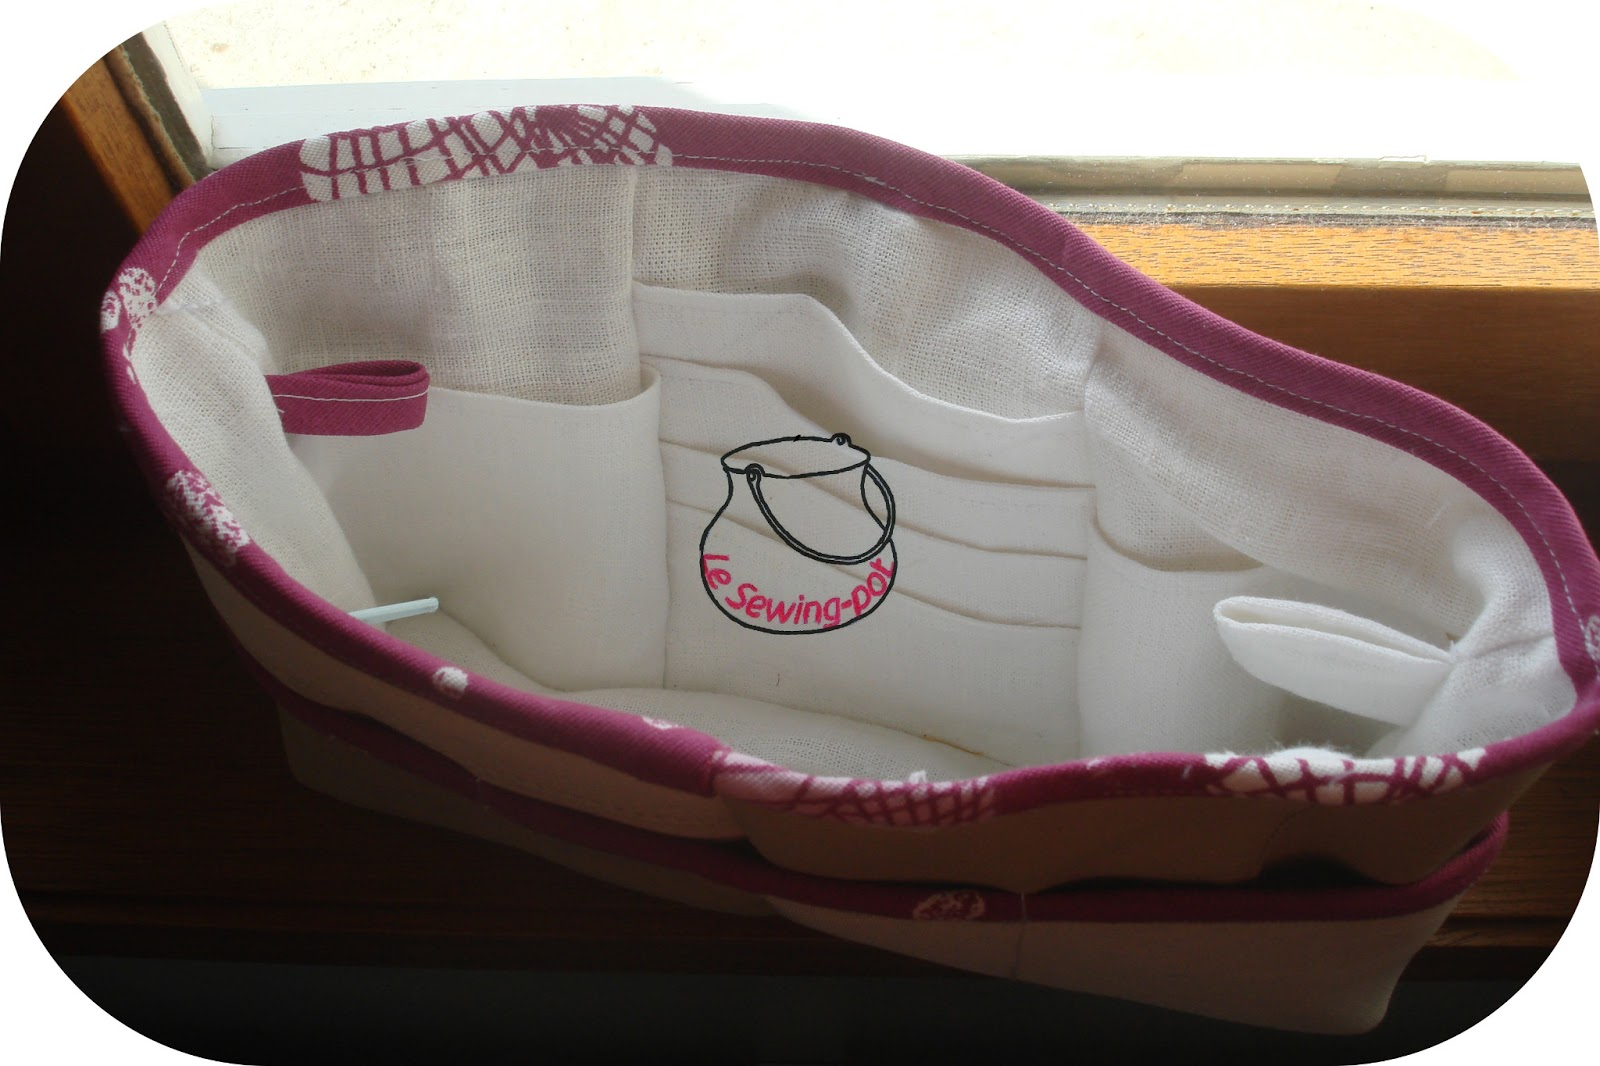 Le sewing pot organisateur sac main hand purse organiser - Tuto organisateur de sac ...